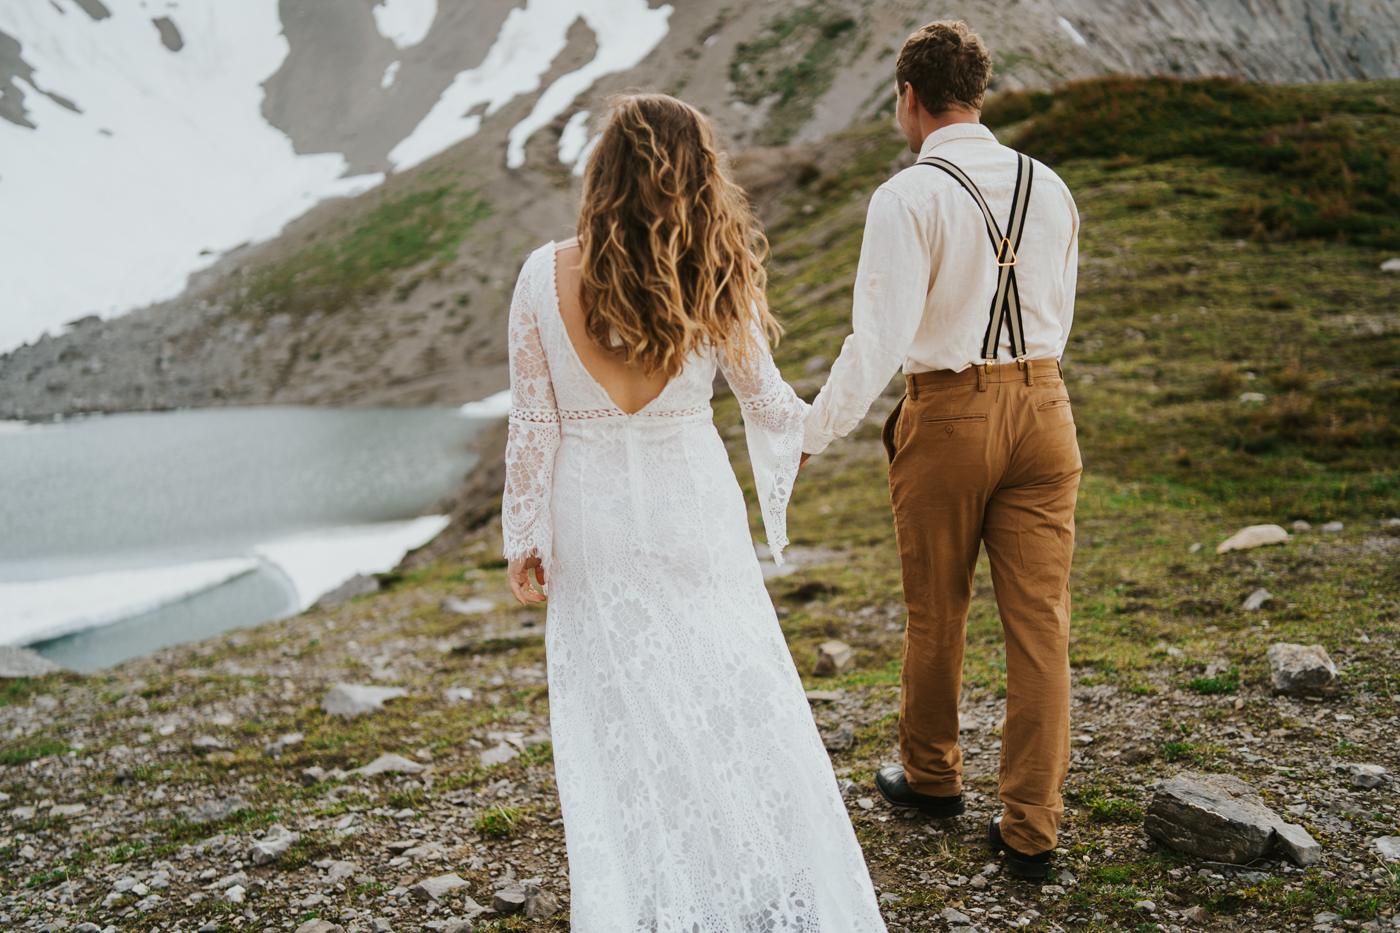 tyraephotography_photographer_wedding_elopement_engagement_photography-07546.jpg